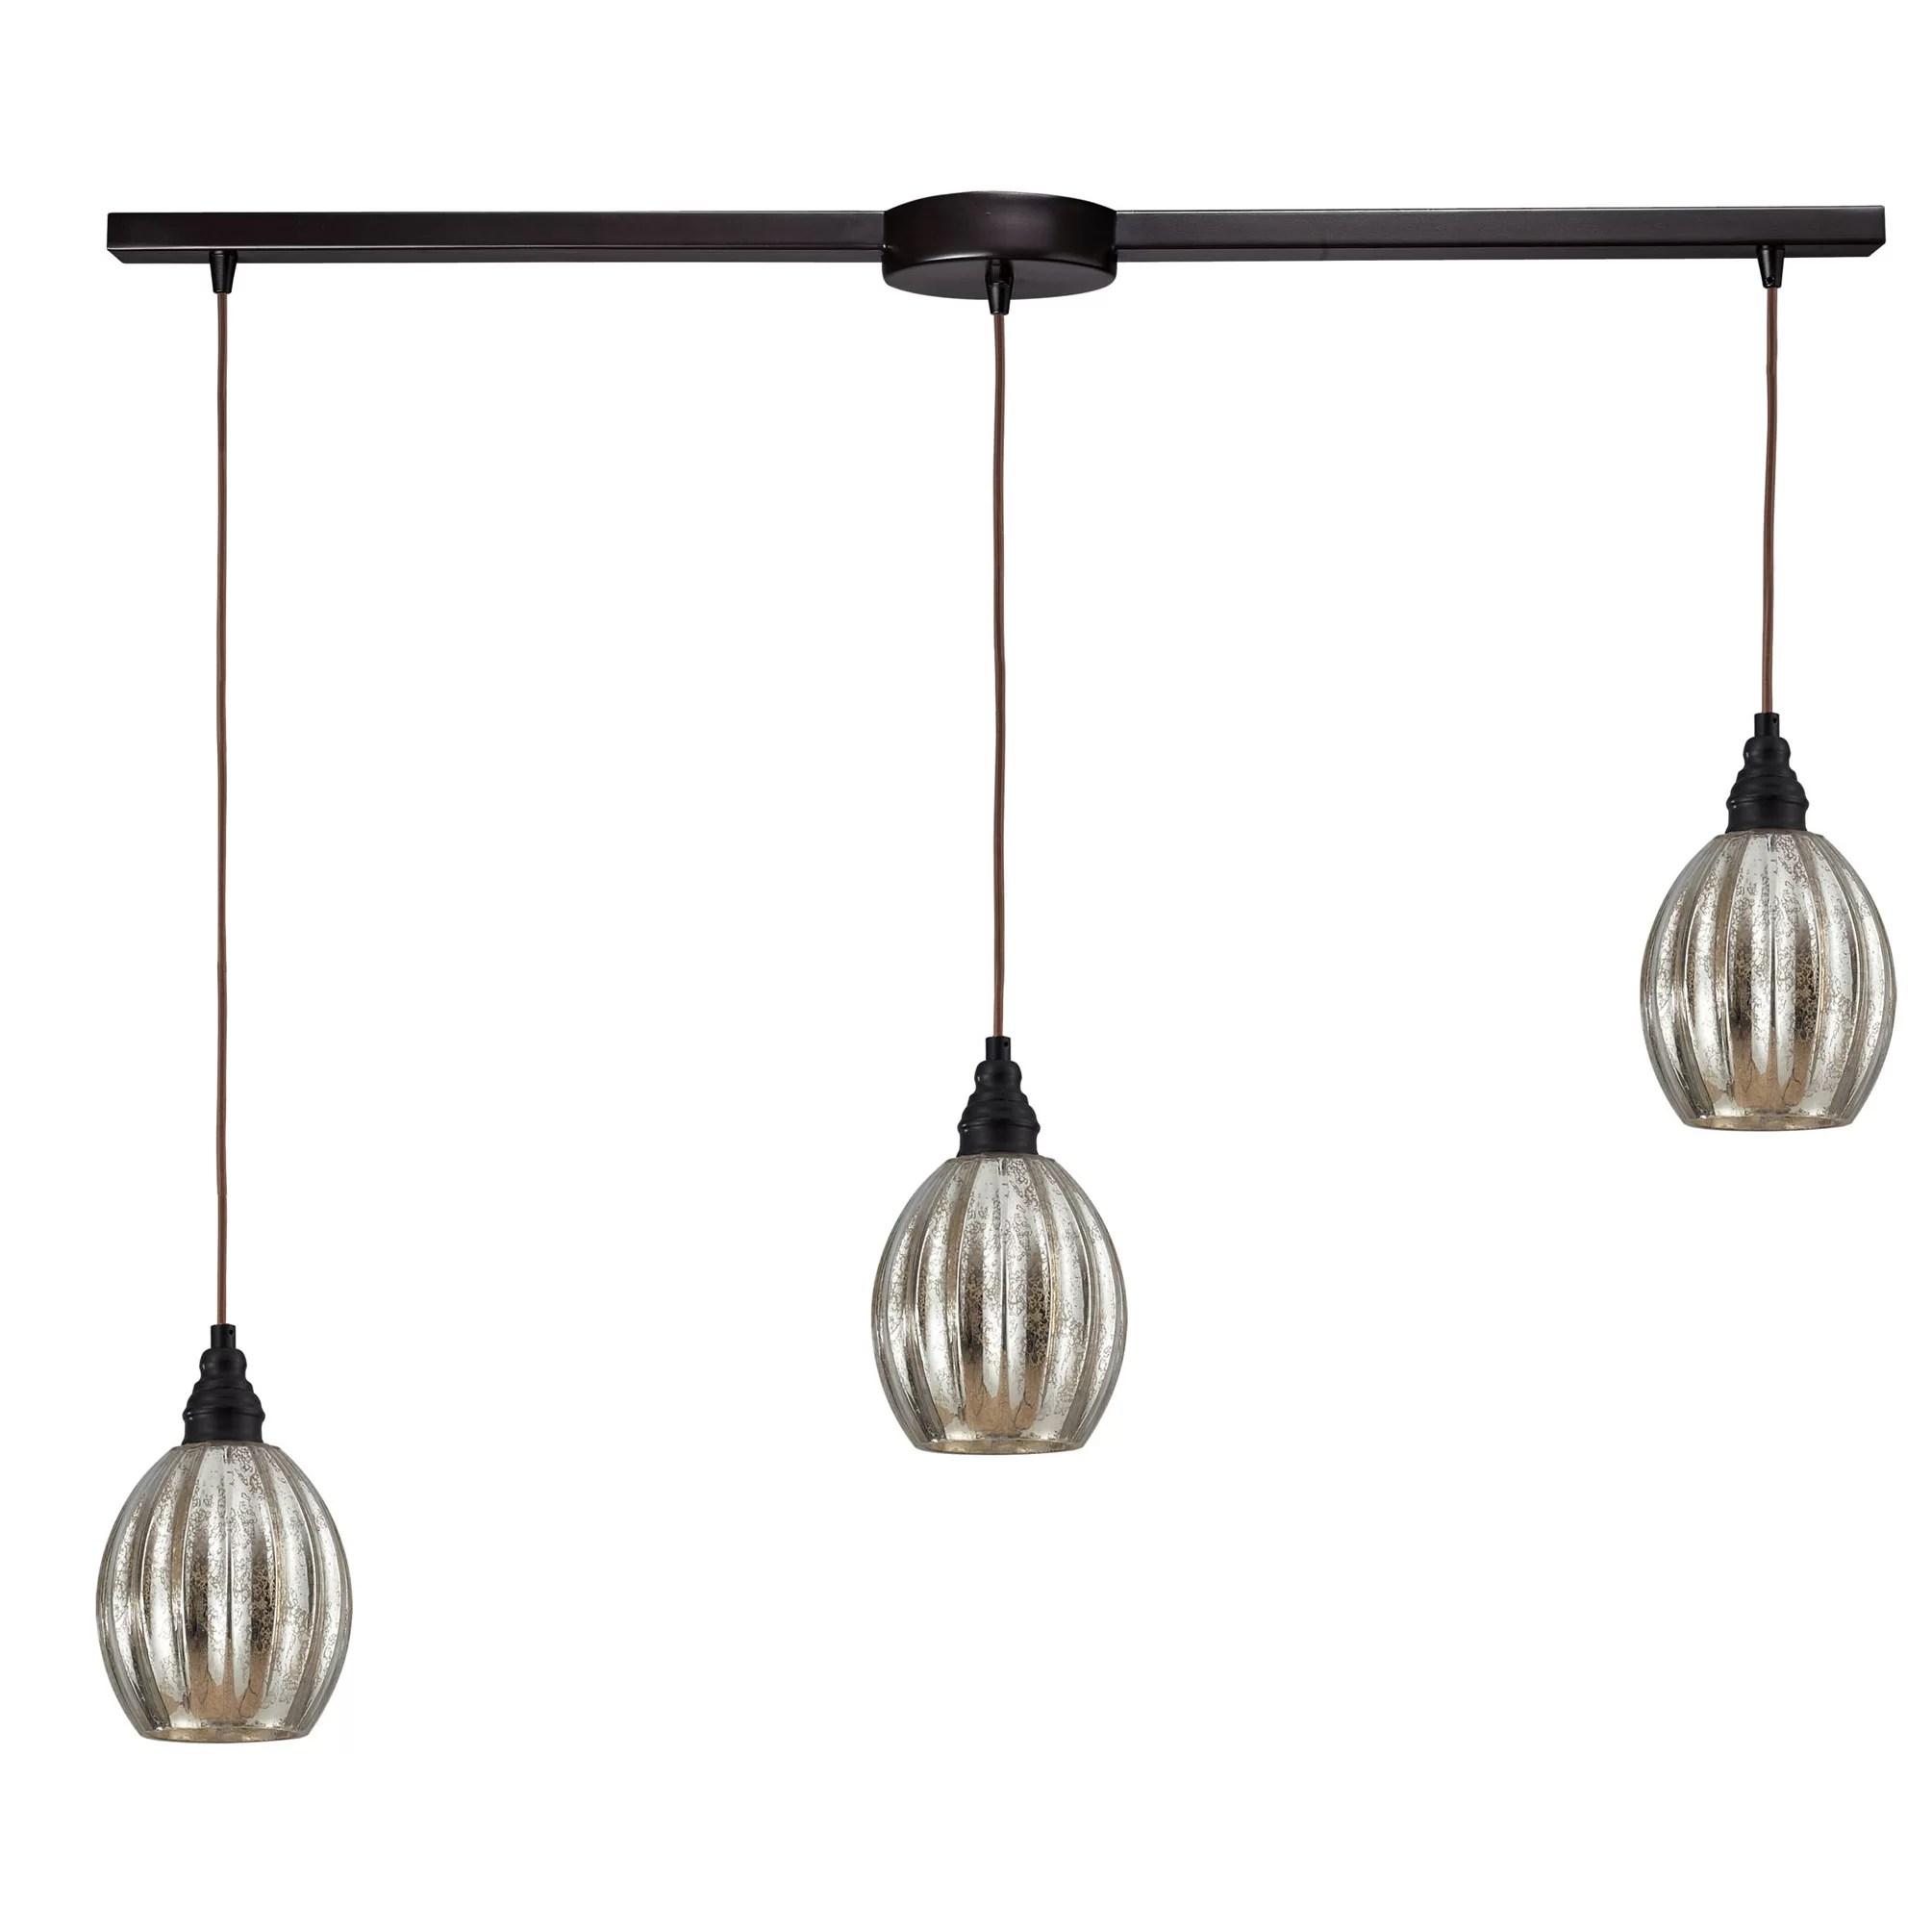 3 light kitchen island pendant cost to replace cabinets elk lighting danica wayfair